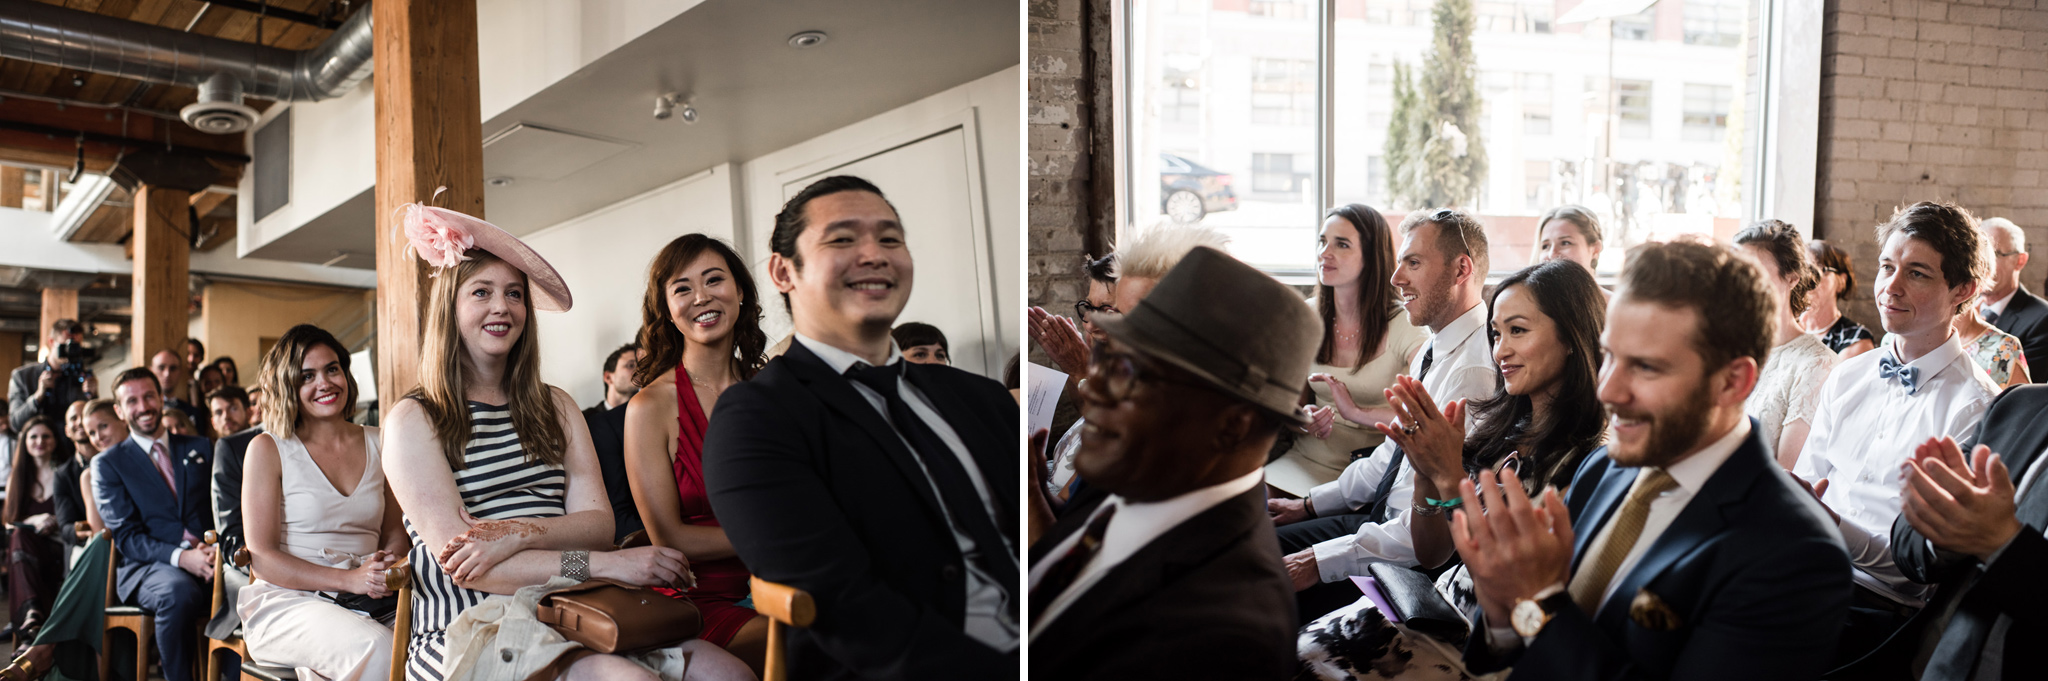 070-wedding-ceremony-reception-recessional-bride-groom-exit-photographer.jpg